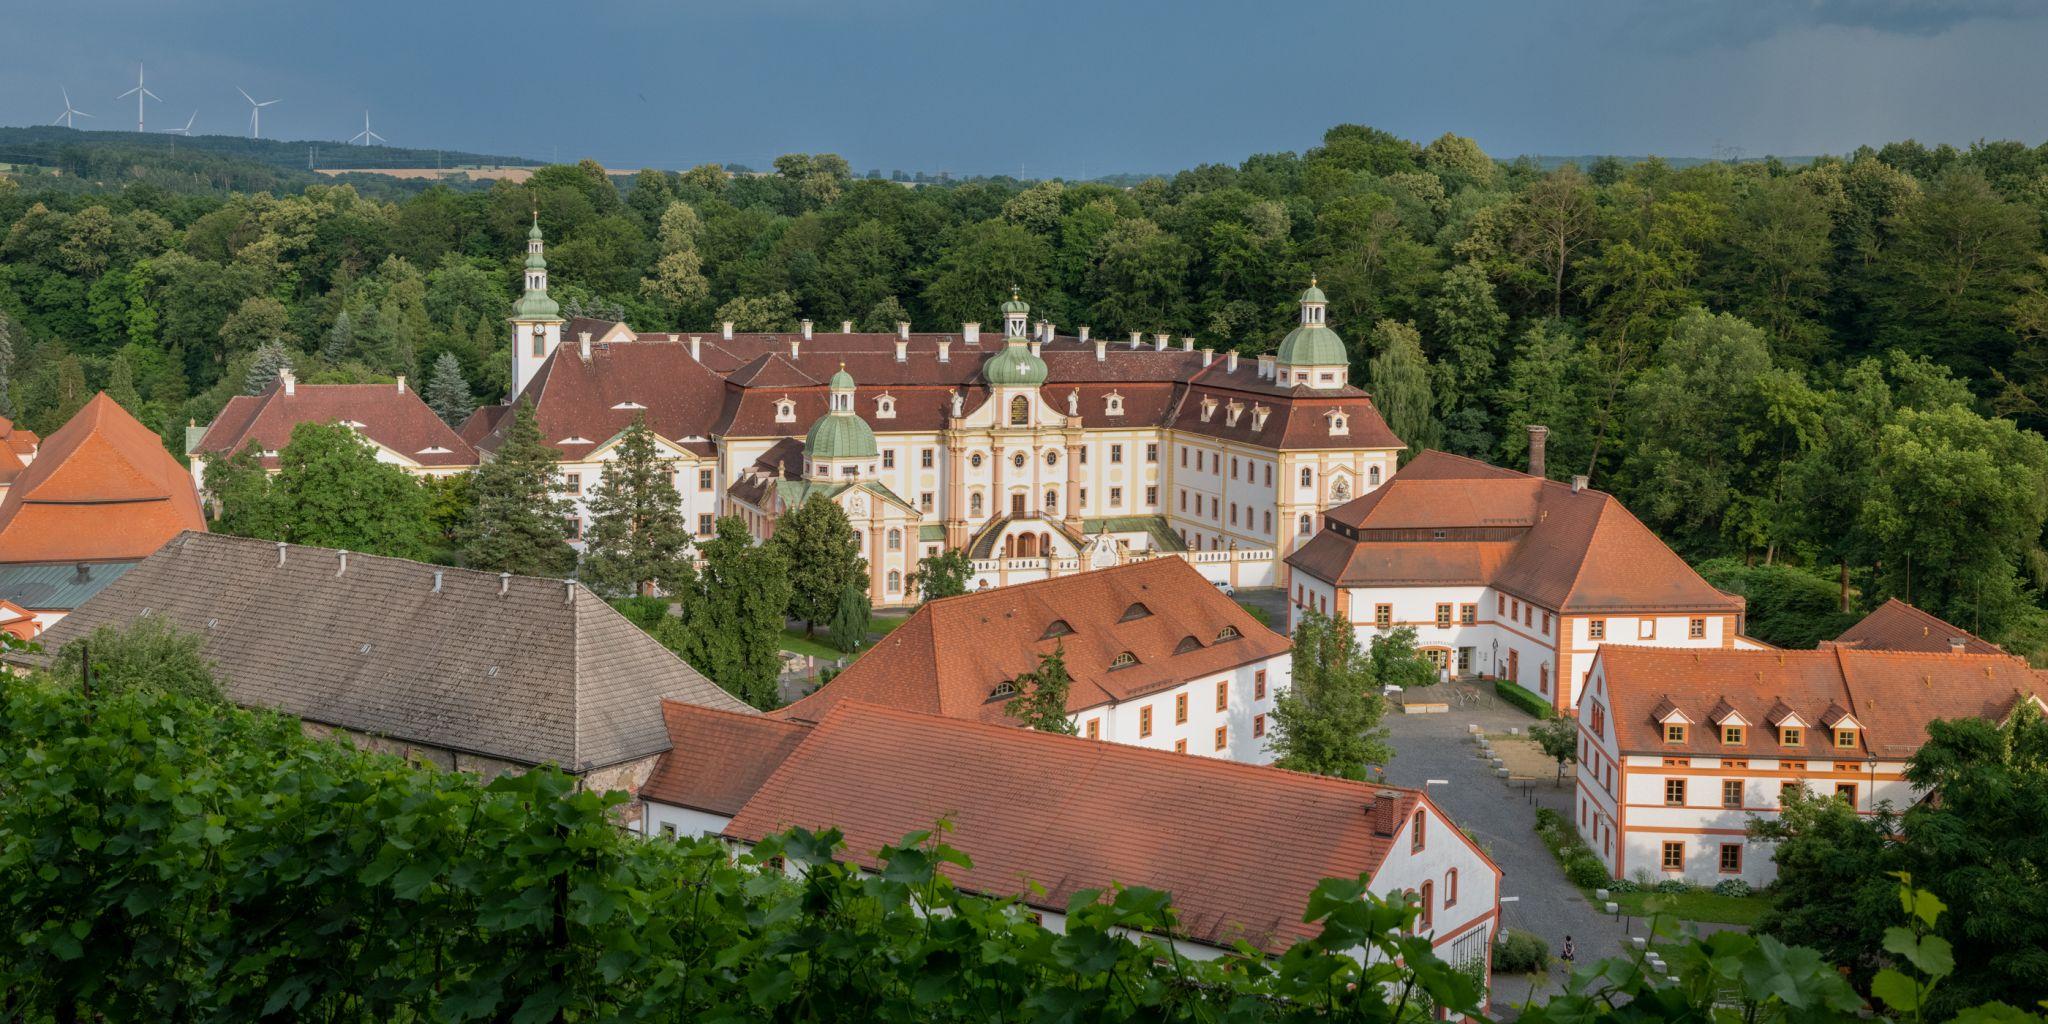 Ostriz,Kloster St. Marienthal, Germany